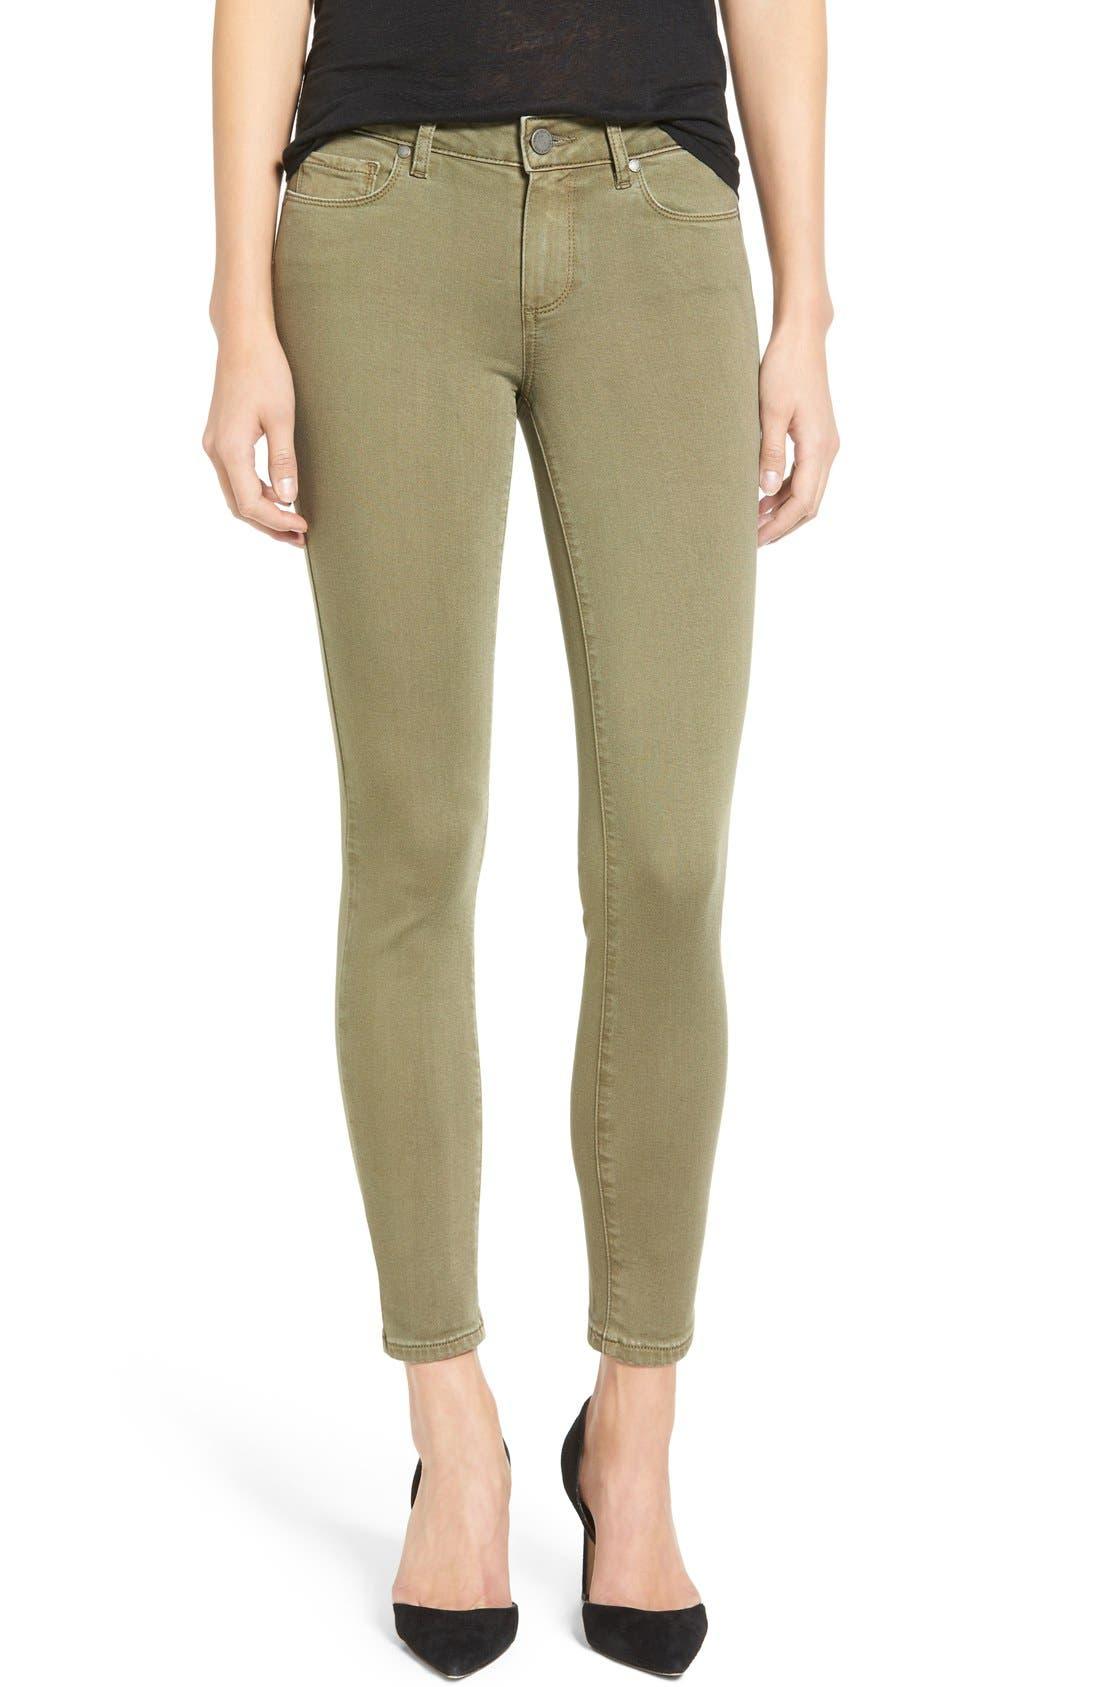 Transcend - Verdugo Ankle Skinny Jeans,                         Main,                         color, 300